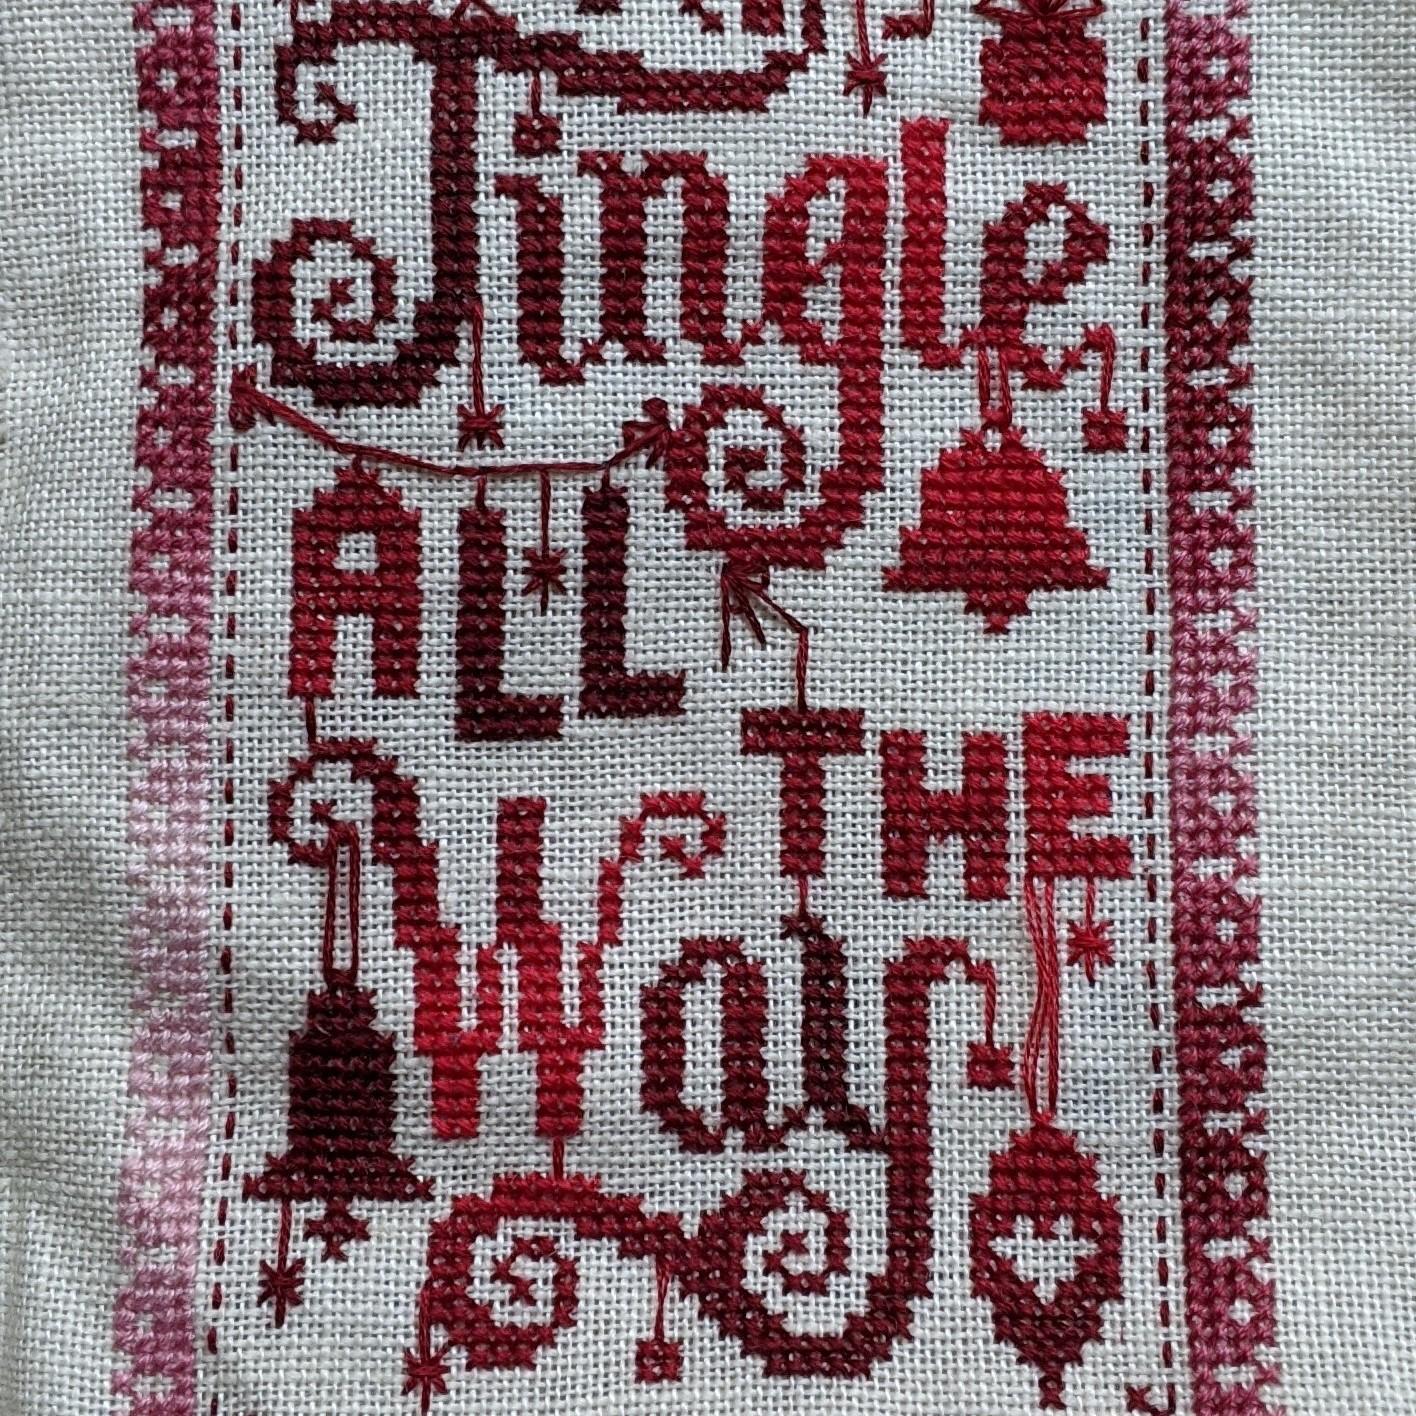 Chart Counted Cross Stitch Pattern Needlework The keeper of secret